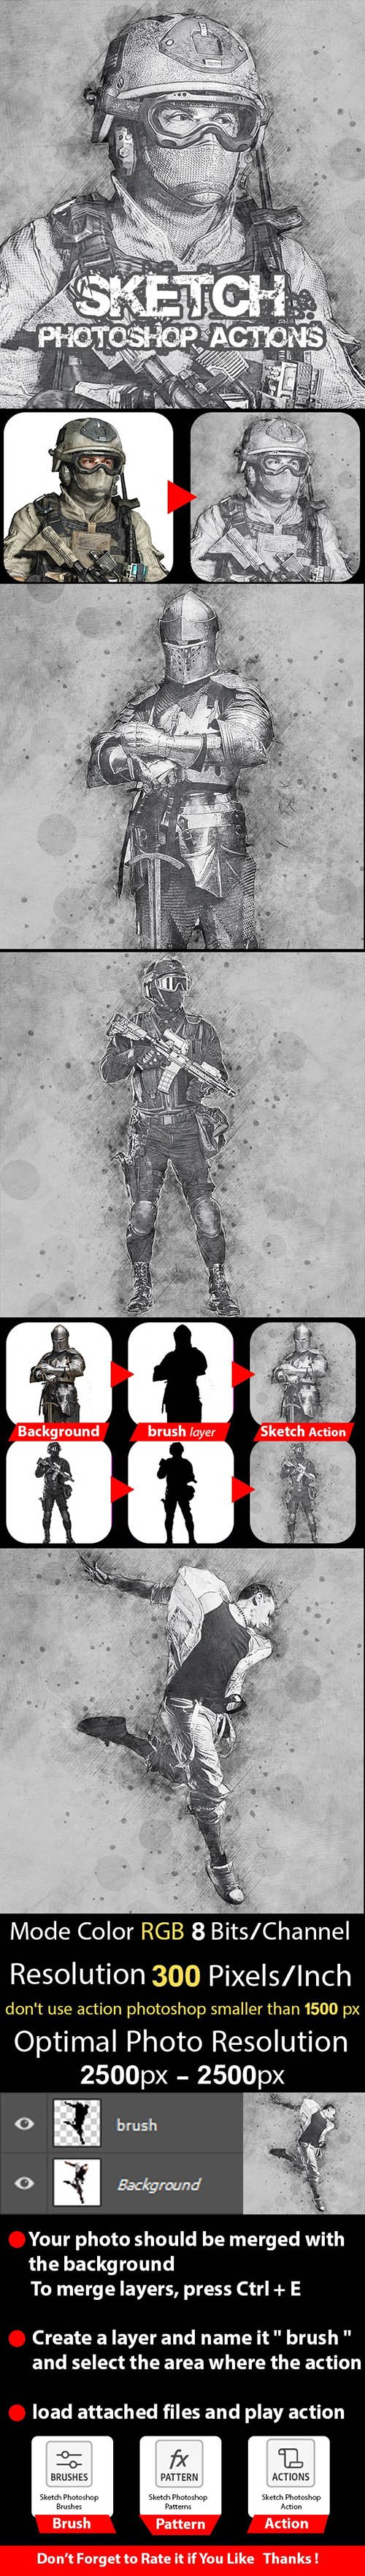 GraphicRiver - Sketch Photoshop Action 24222735